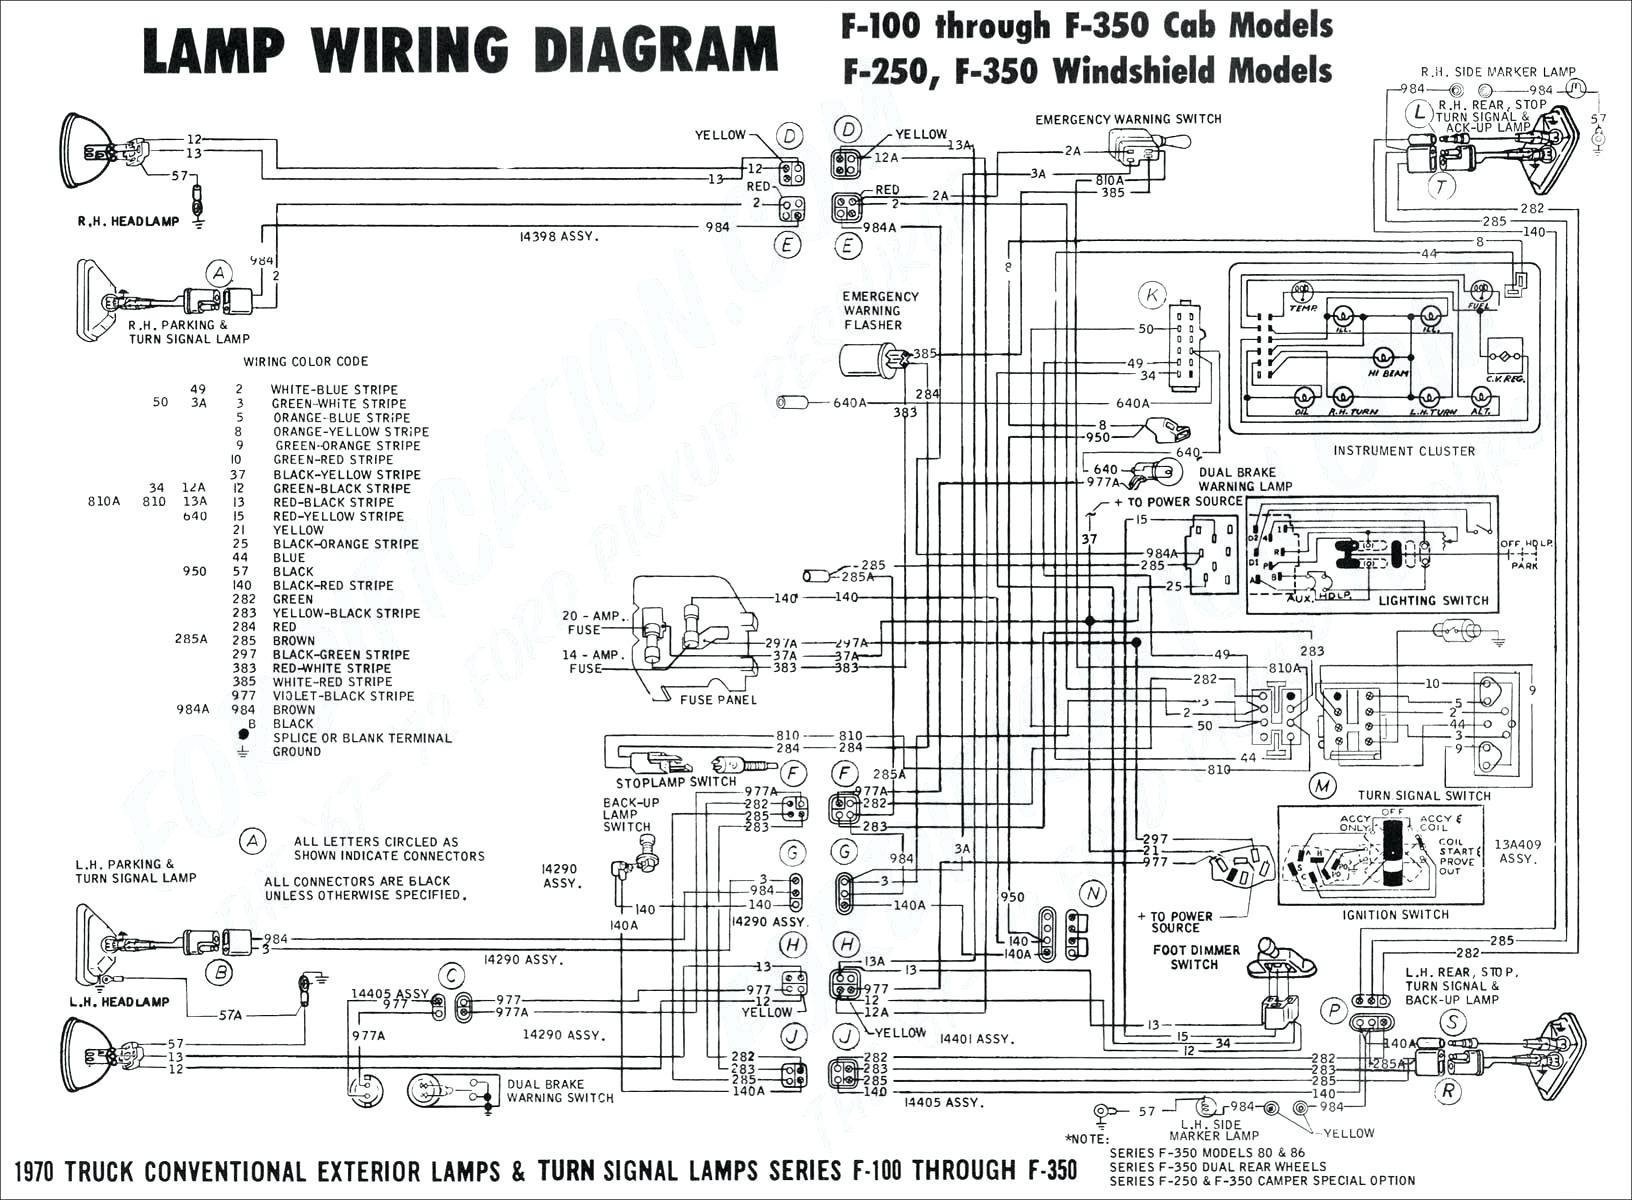 1979 Chevy Truck Radio Wiring Diagram 1981 Goldwing Wiring Diagram Of 1979 Chevy Truck Radio Wiring Diagram